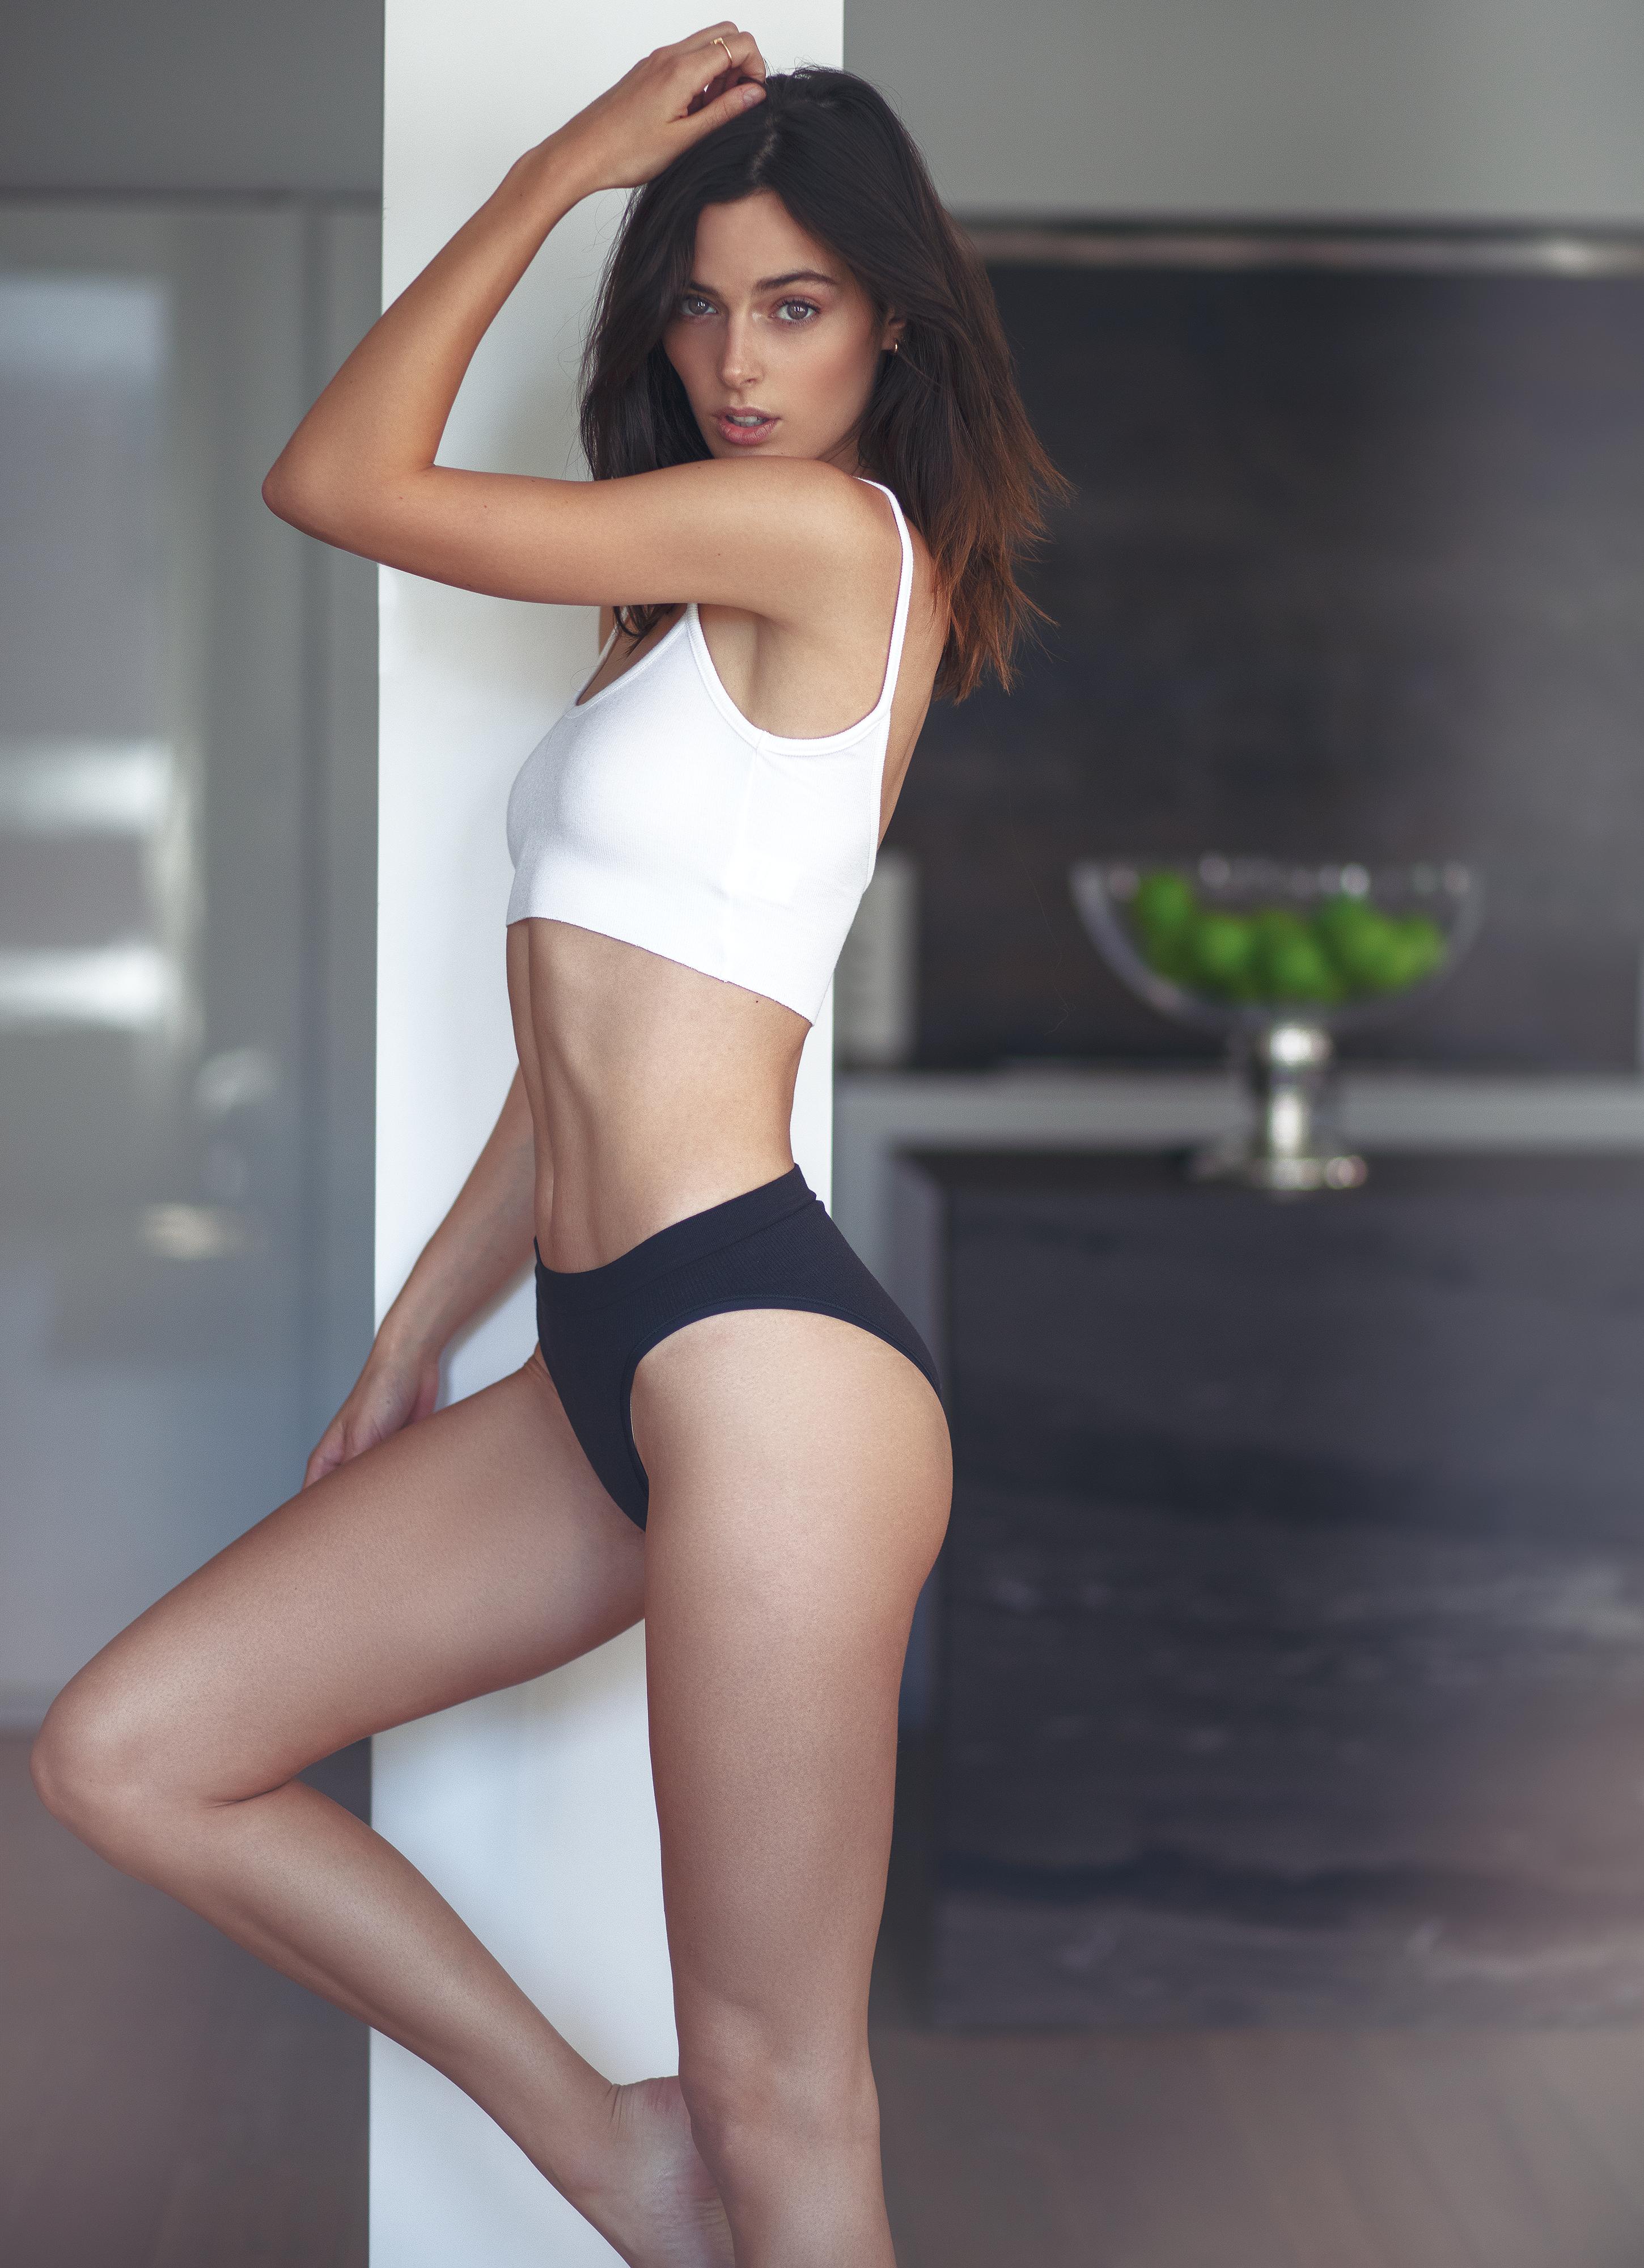 Cleavage Sadie Newman nude photos 2019